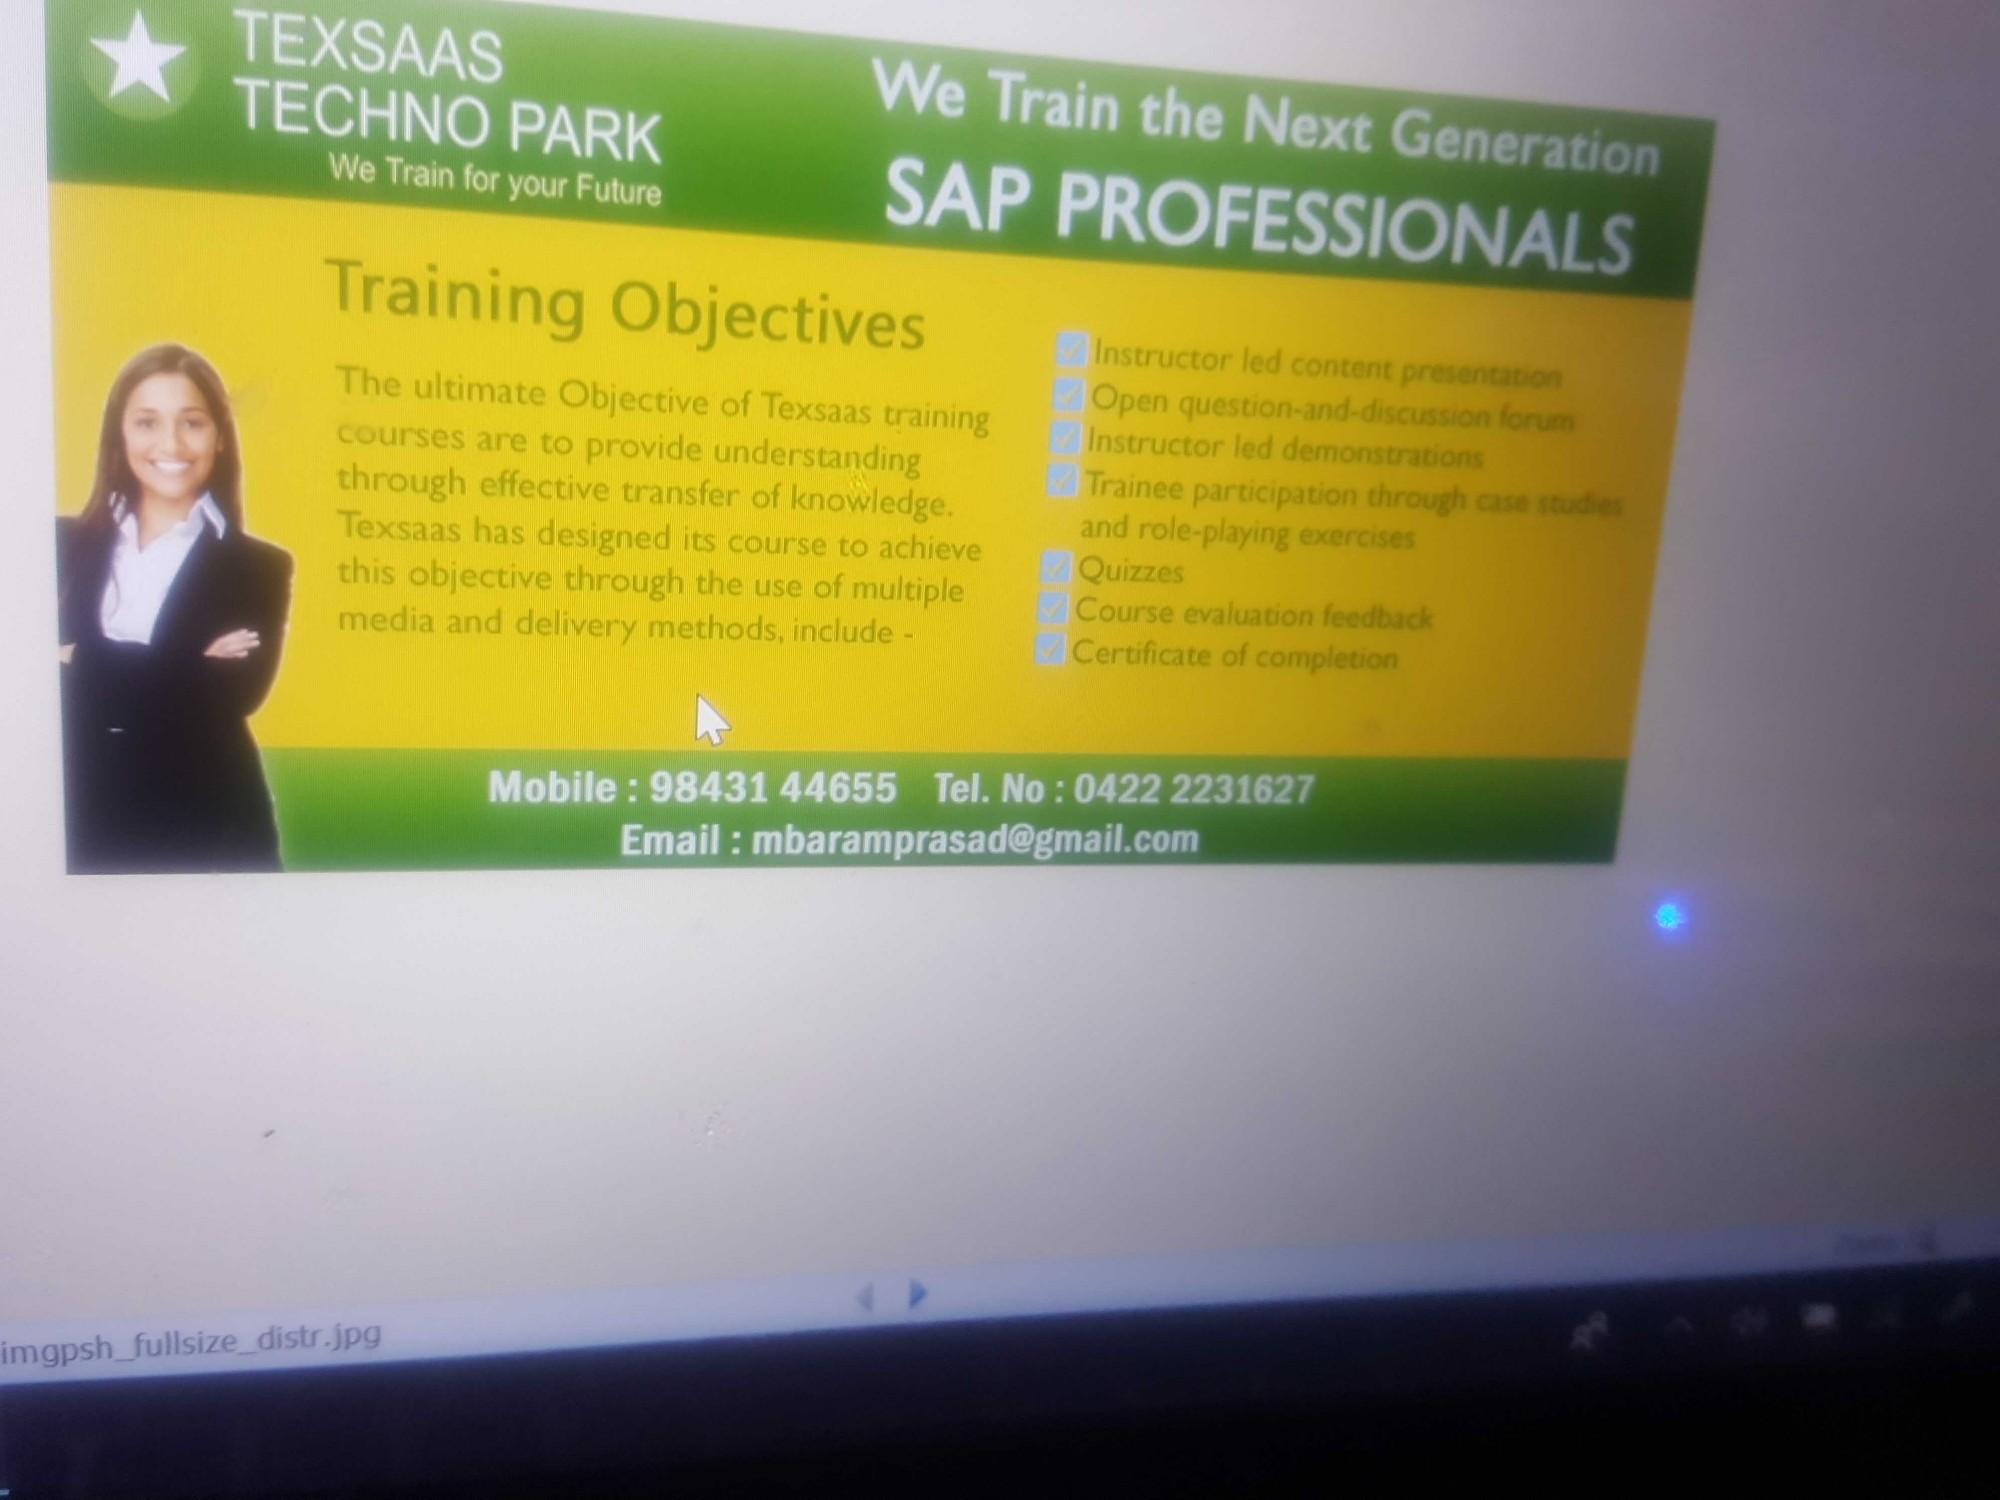 SAP S/4HANA Training in Coimbatore, SAP S/4HANA Course in